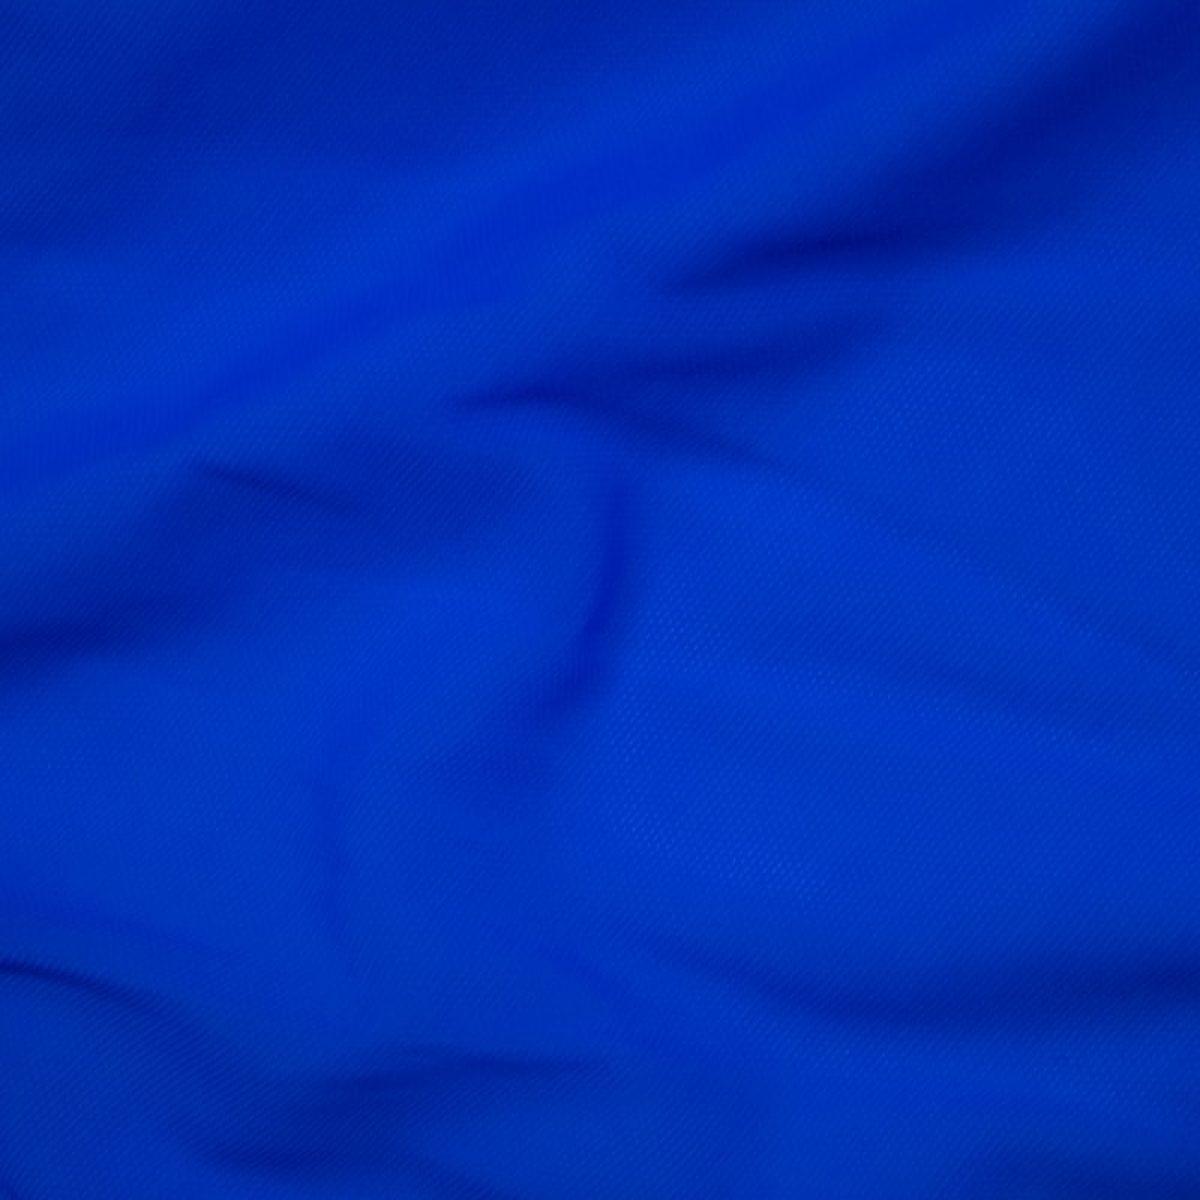 Velo Bluette 208